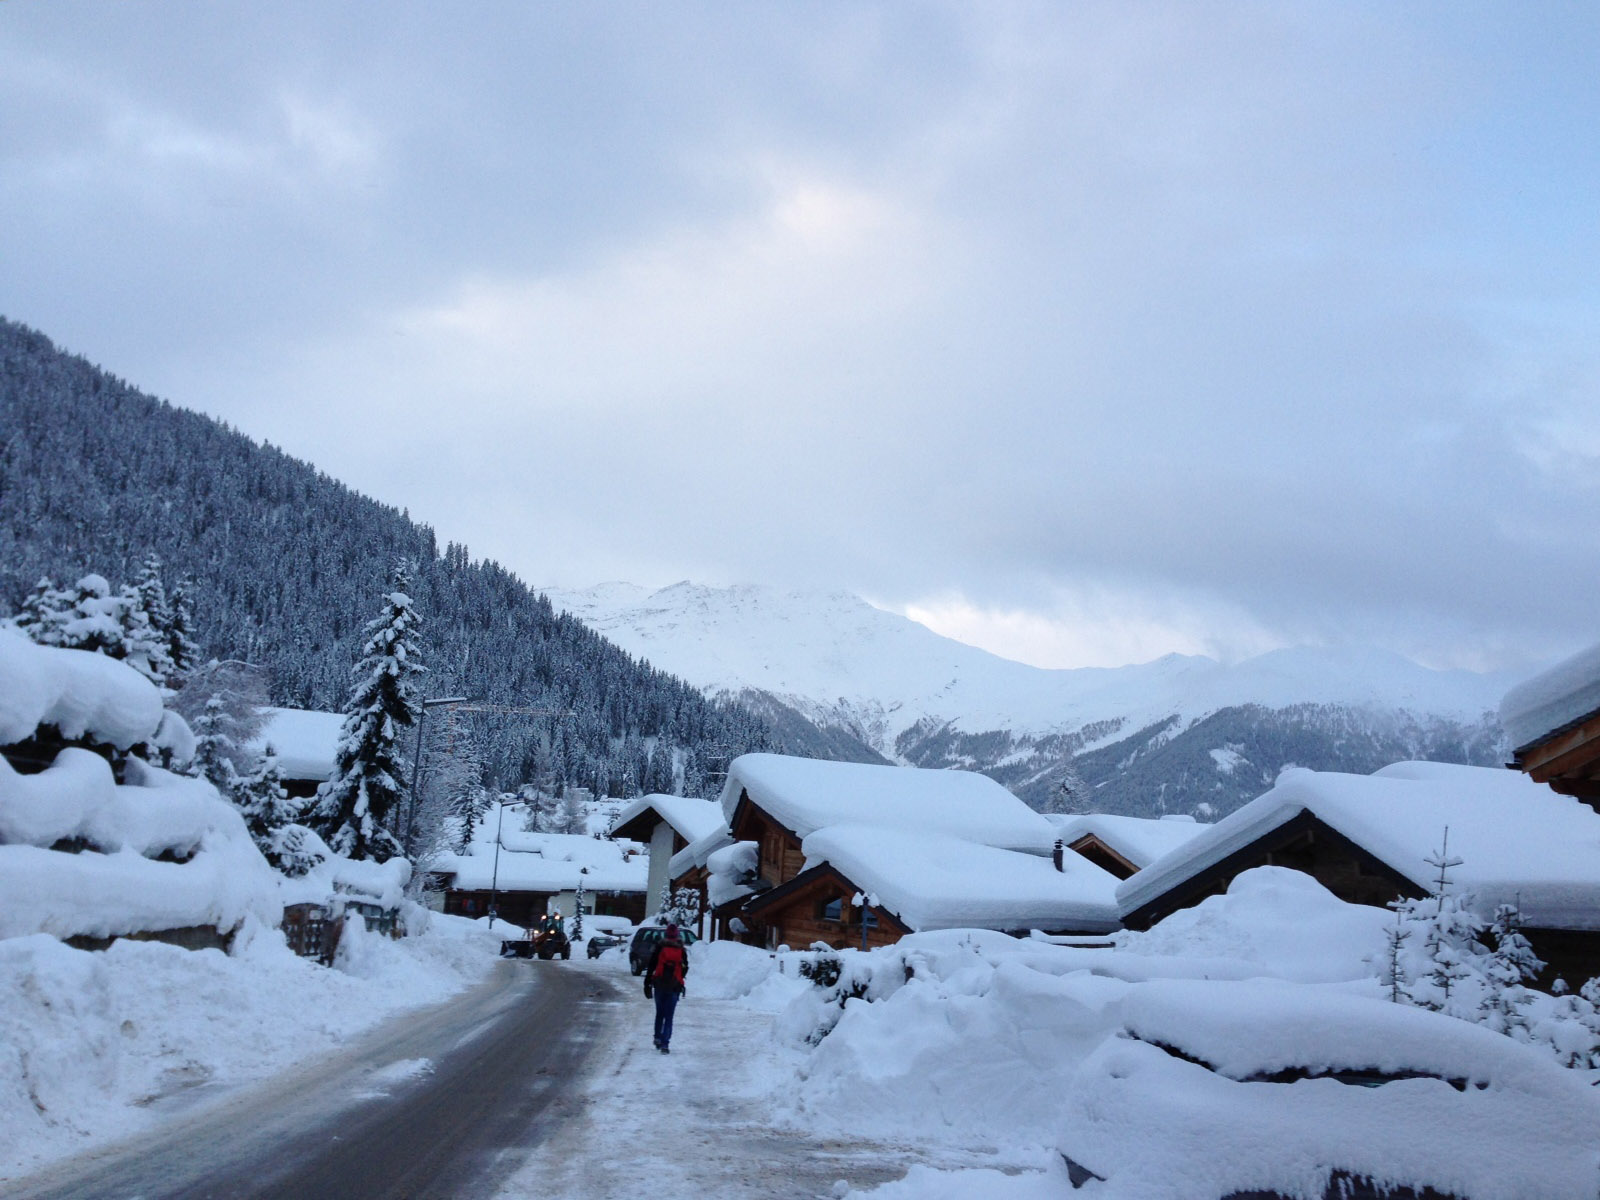 It Keeps Snowing 17 12 12 Ski And Snowboard School In